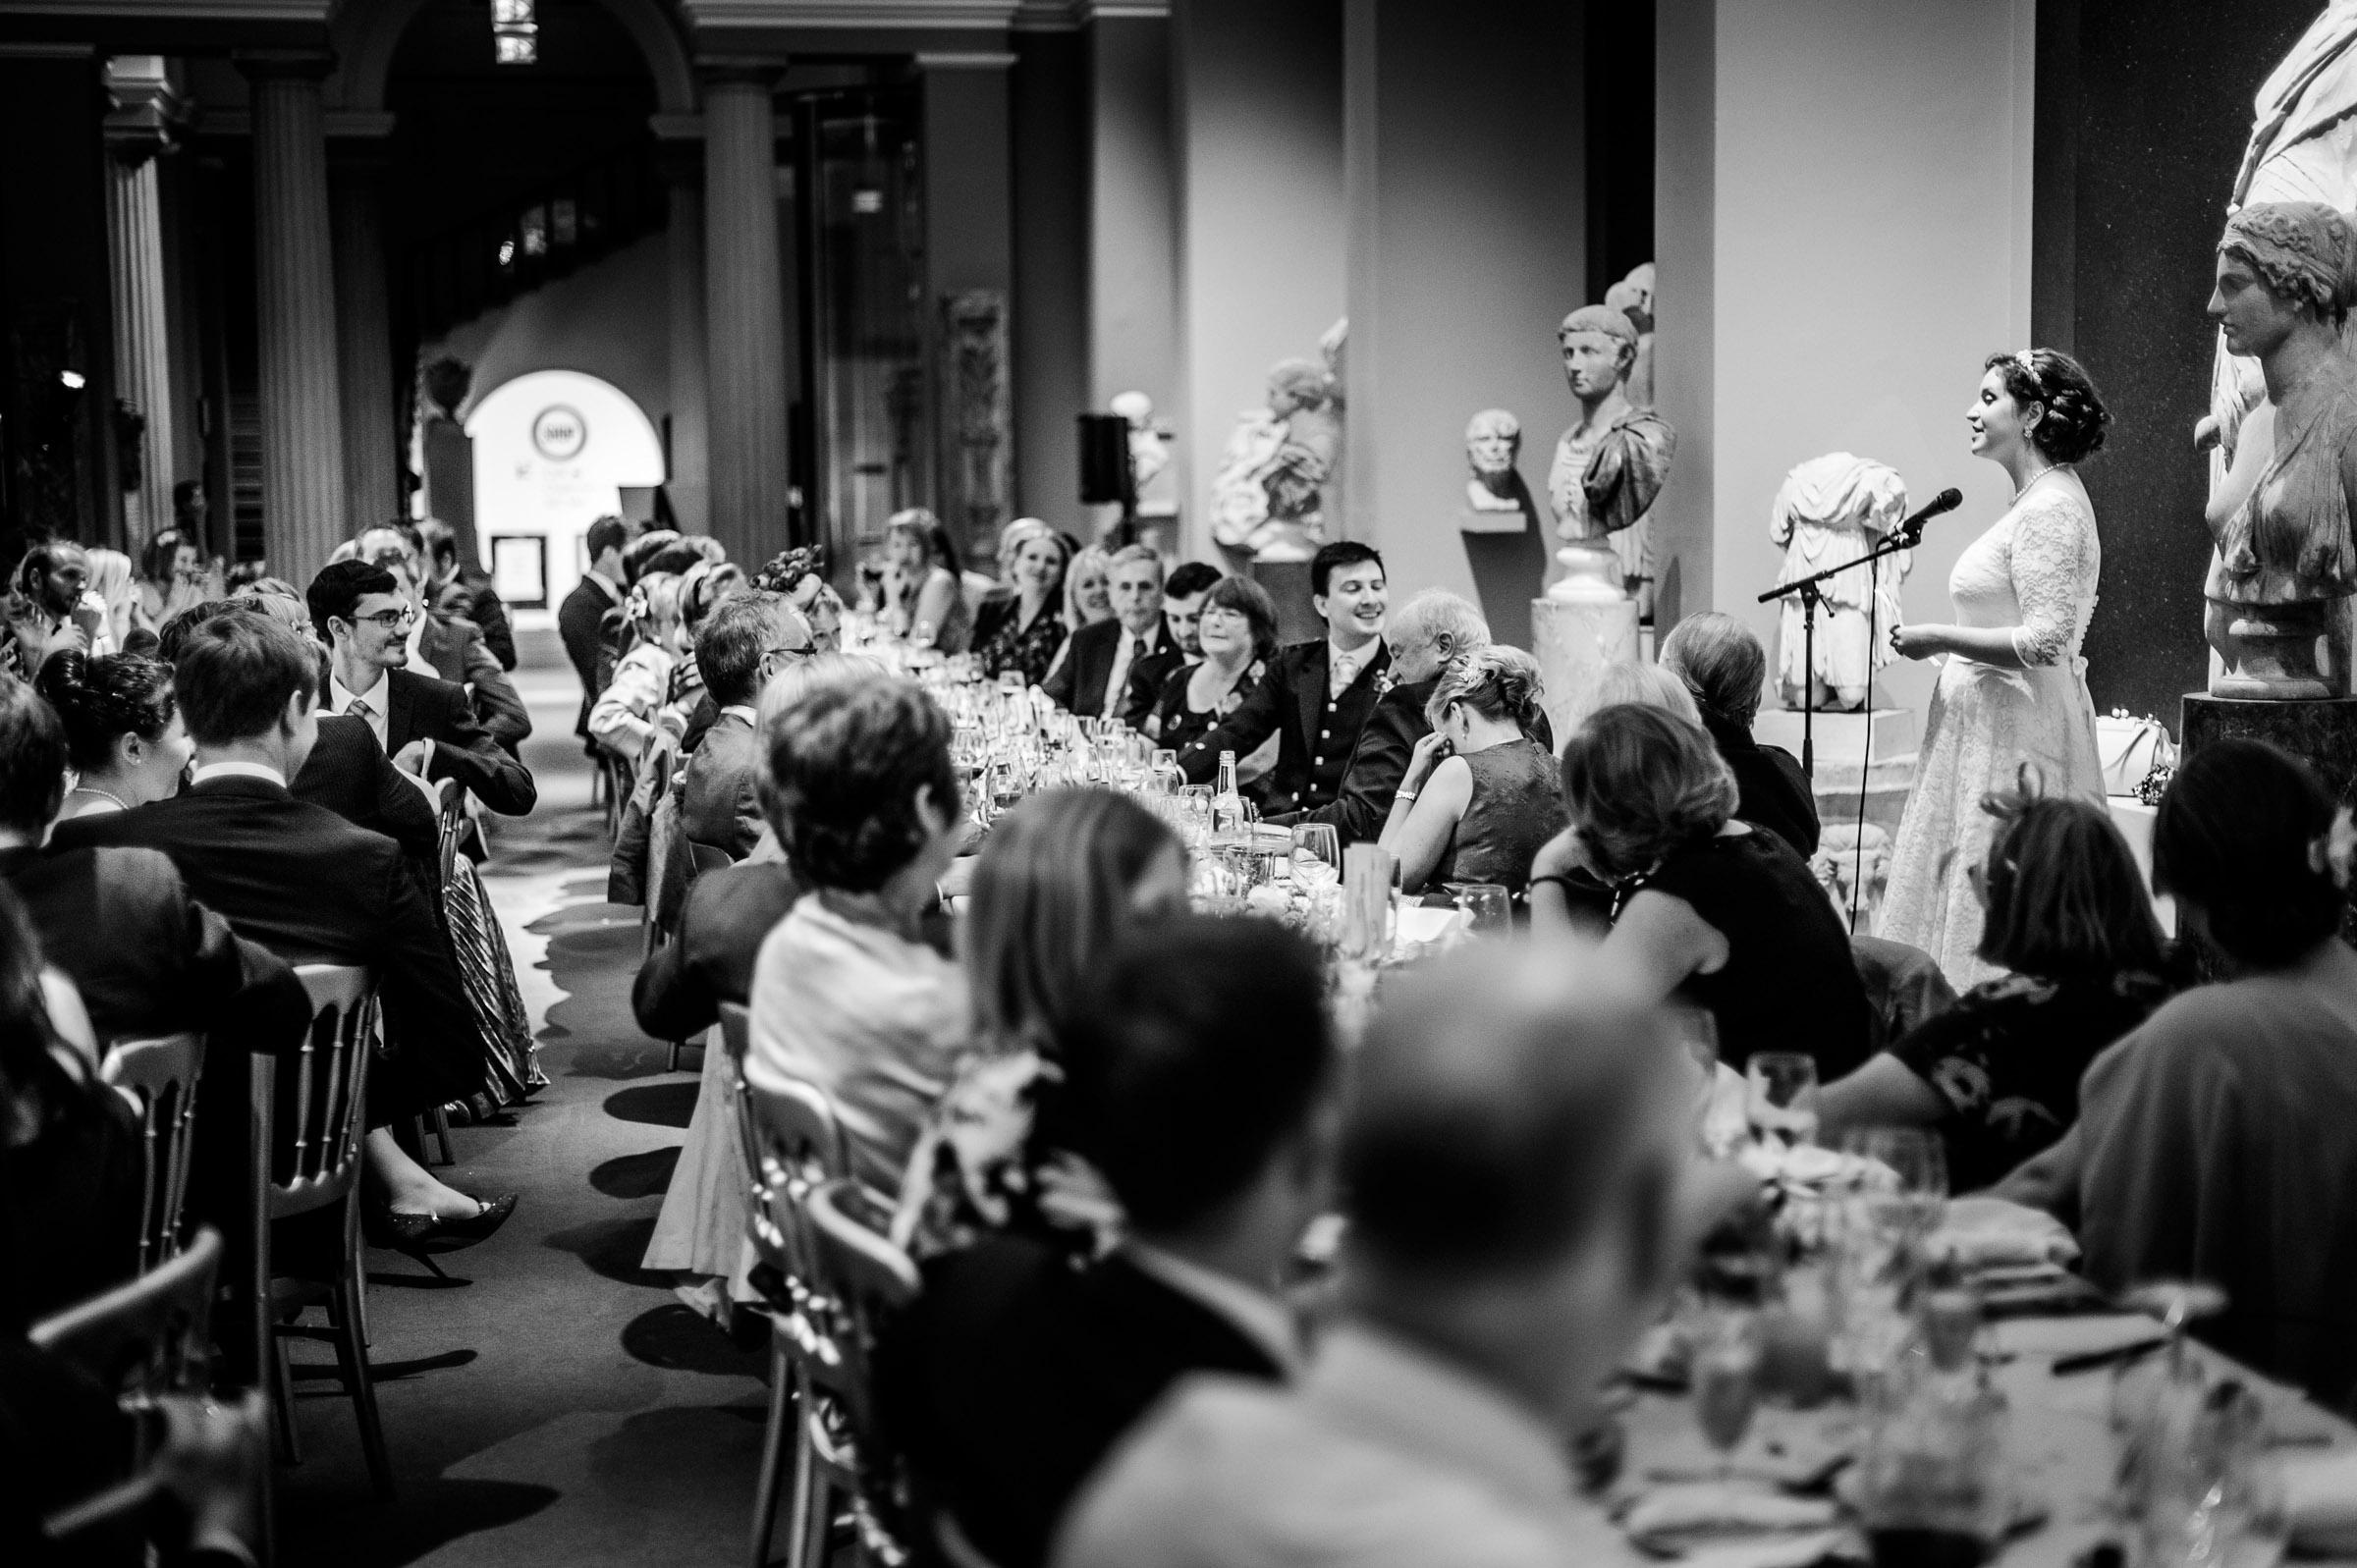 Ashmolean-Museum-Wedding-Pictures-0056.jpg